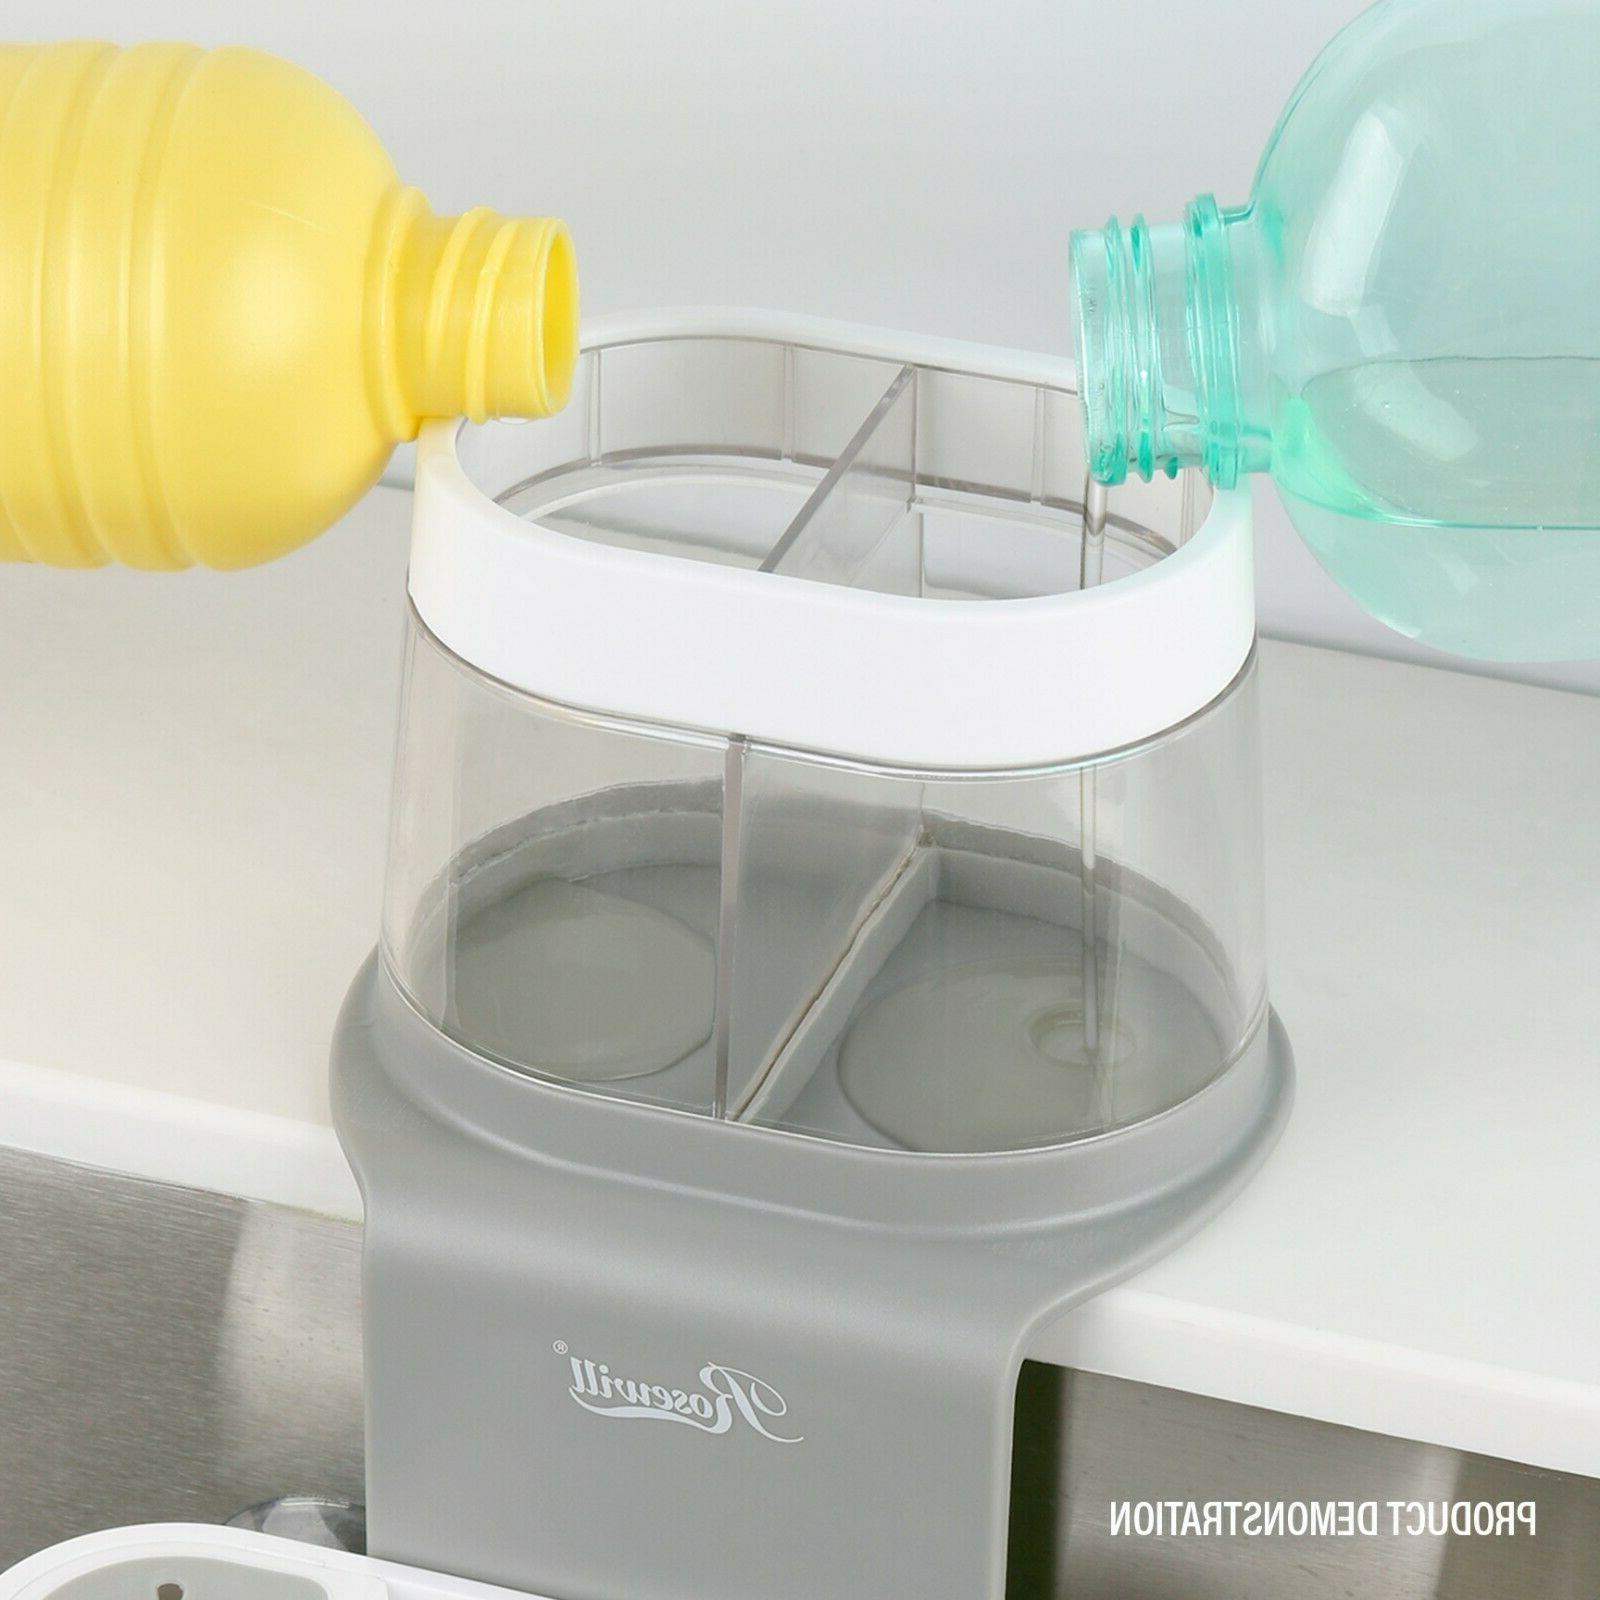 Foldable Dish w/ Drainer & Holder Soap Dispenser Sink Caddy